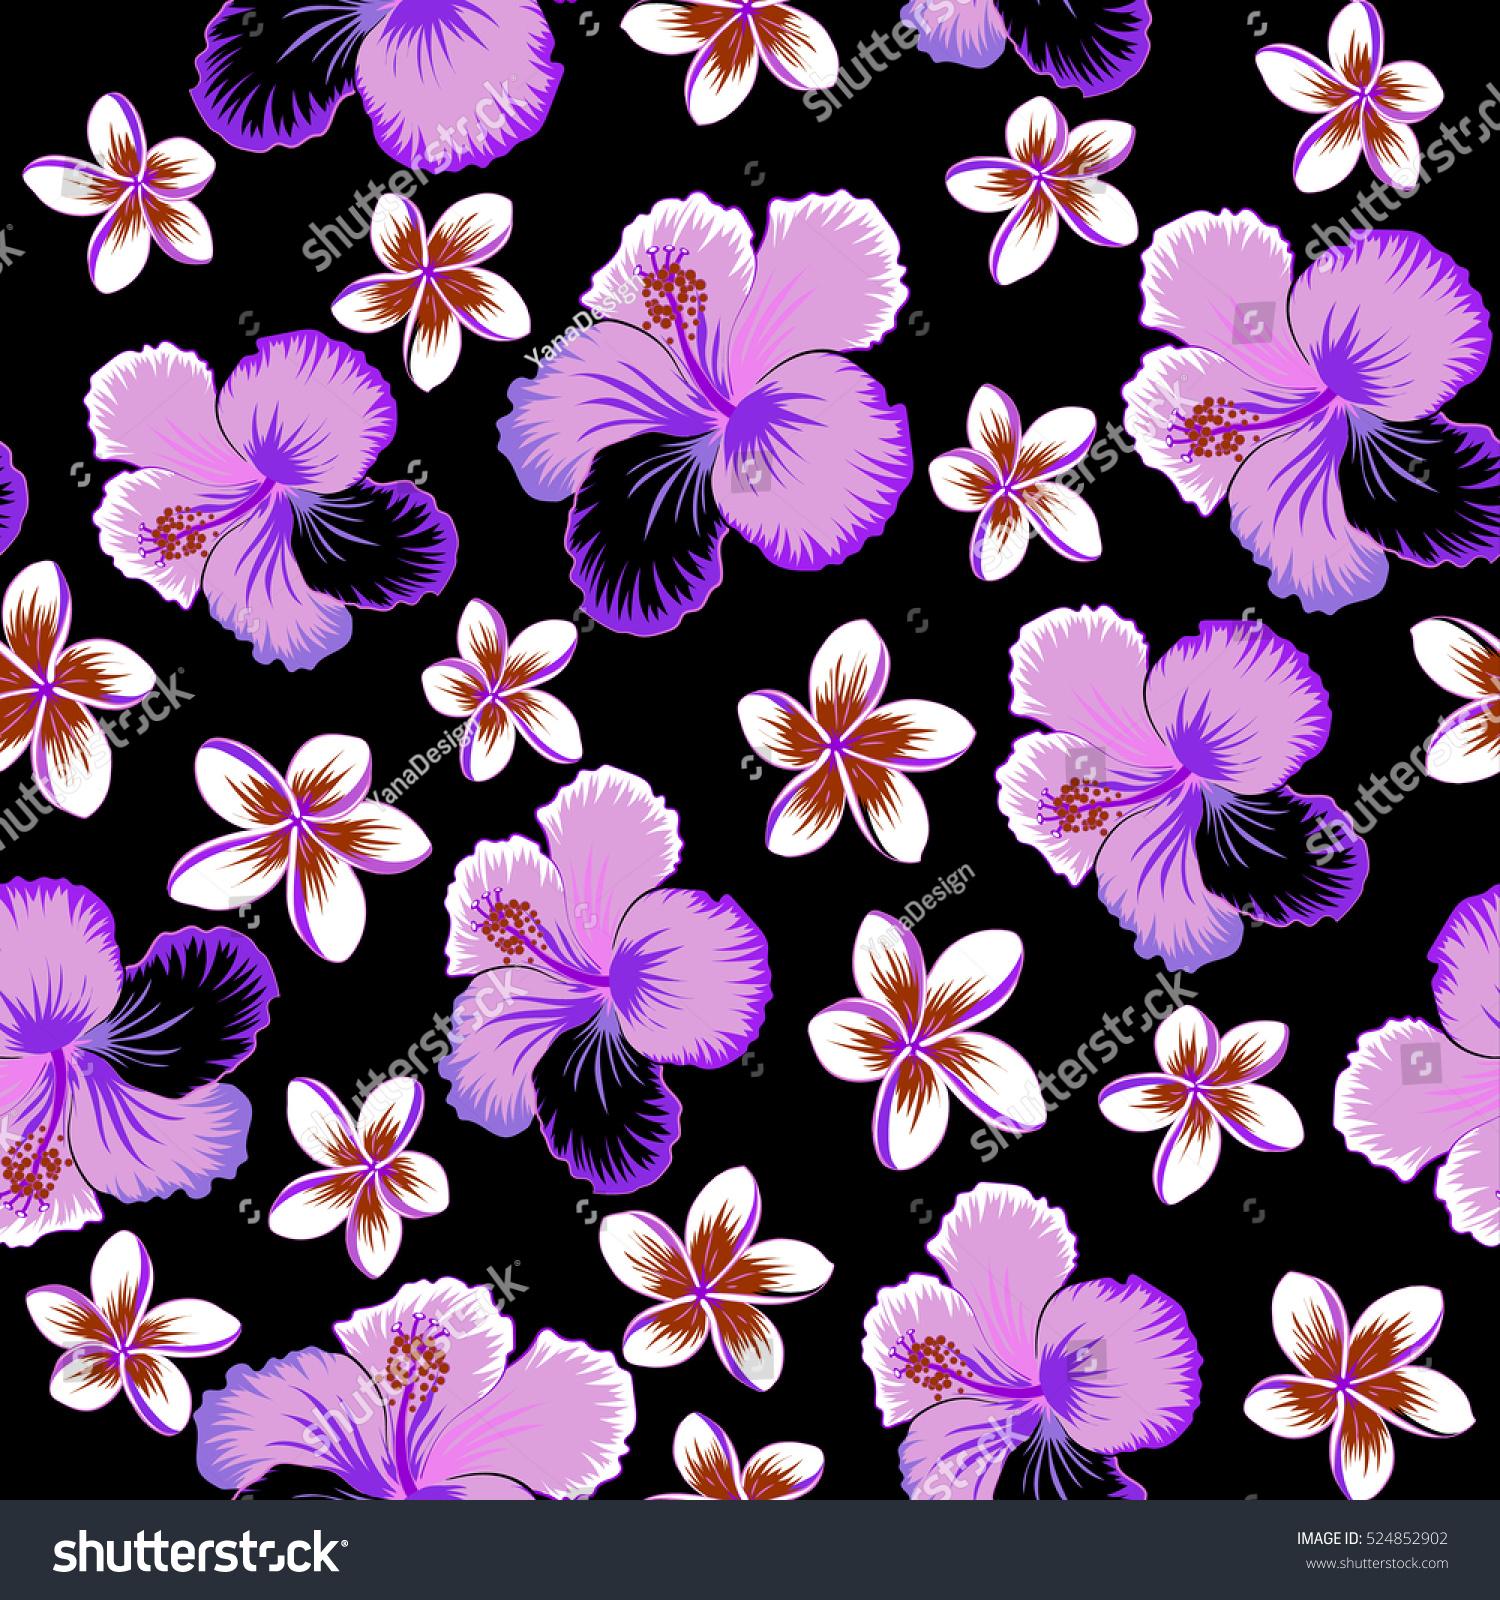 Sc Design Stoelen.Hibiscus Flowers On Black Background Violet Stock Vector Royalty